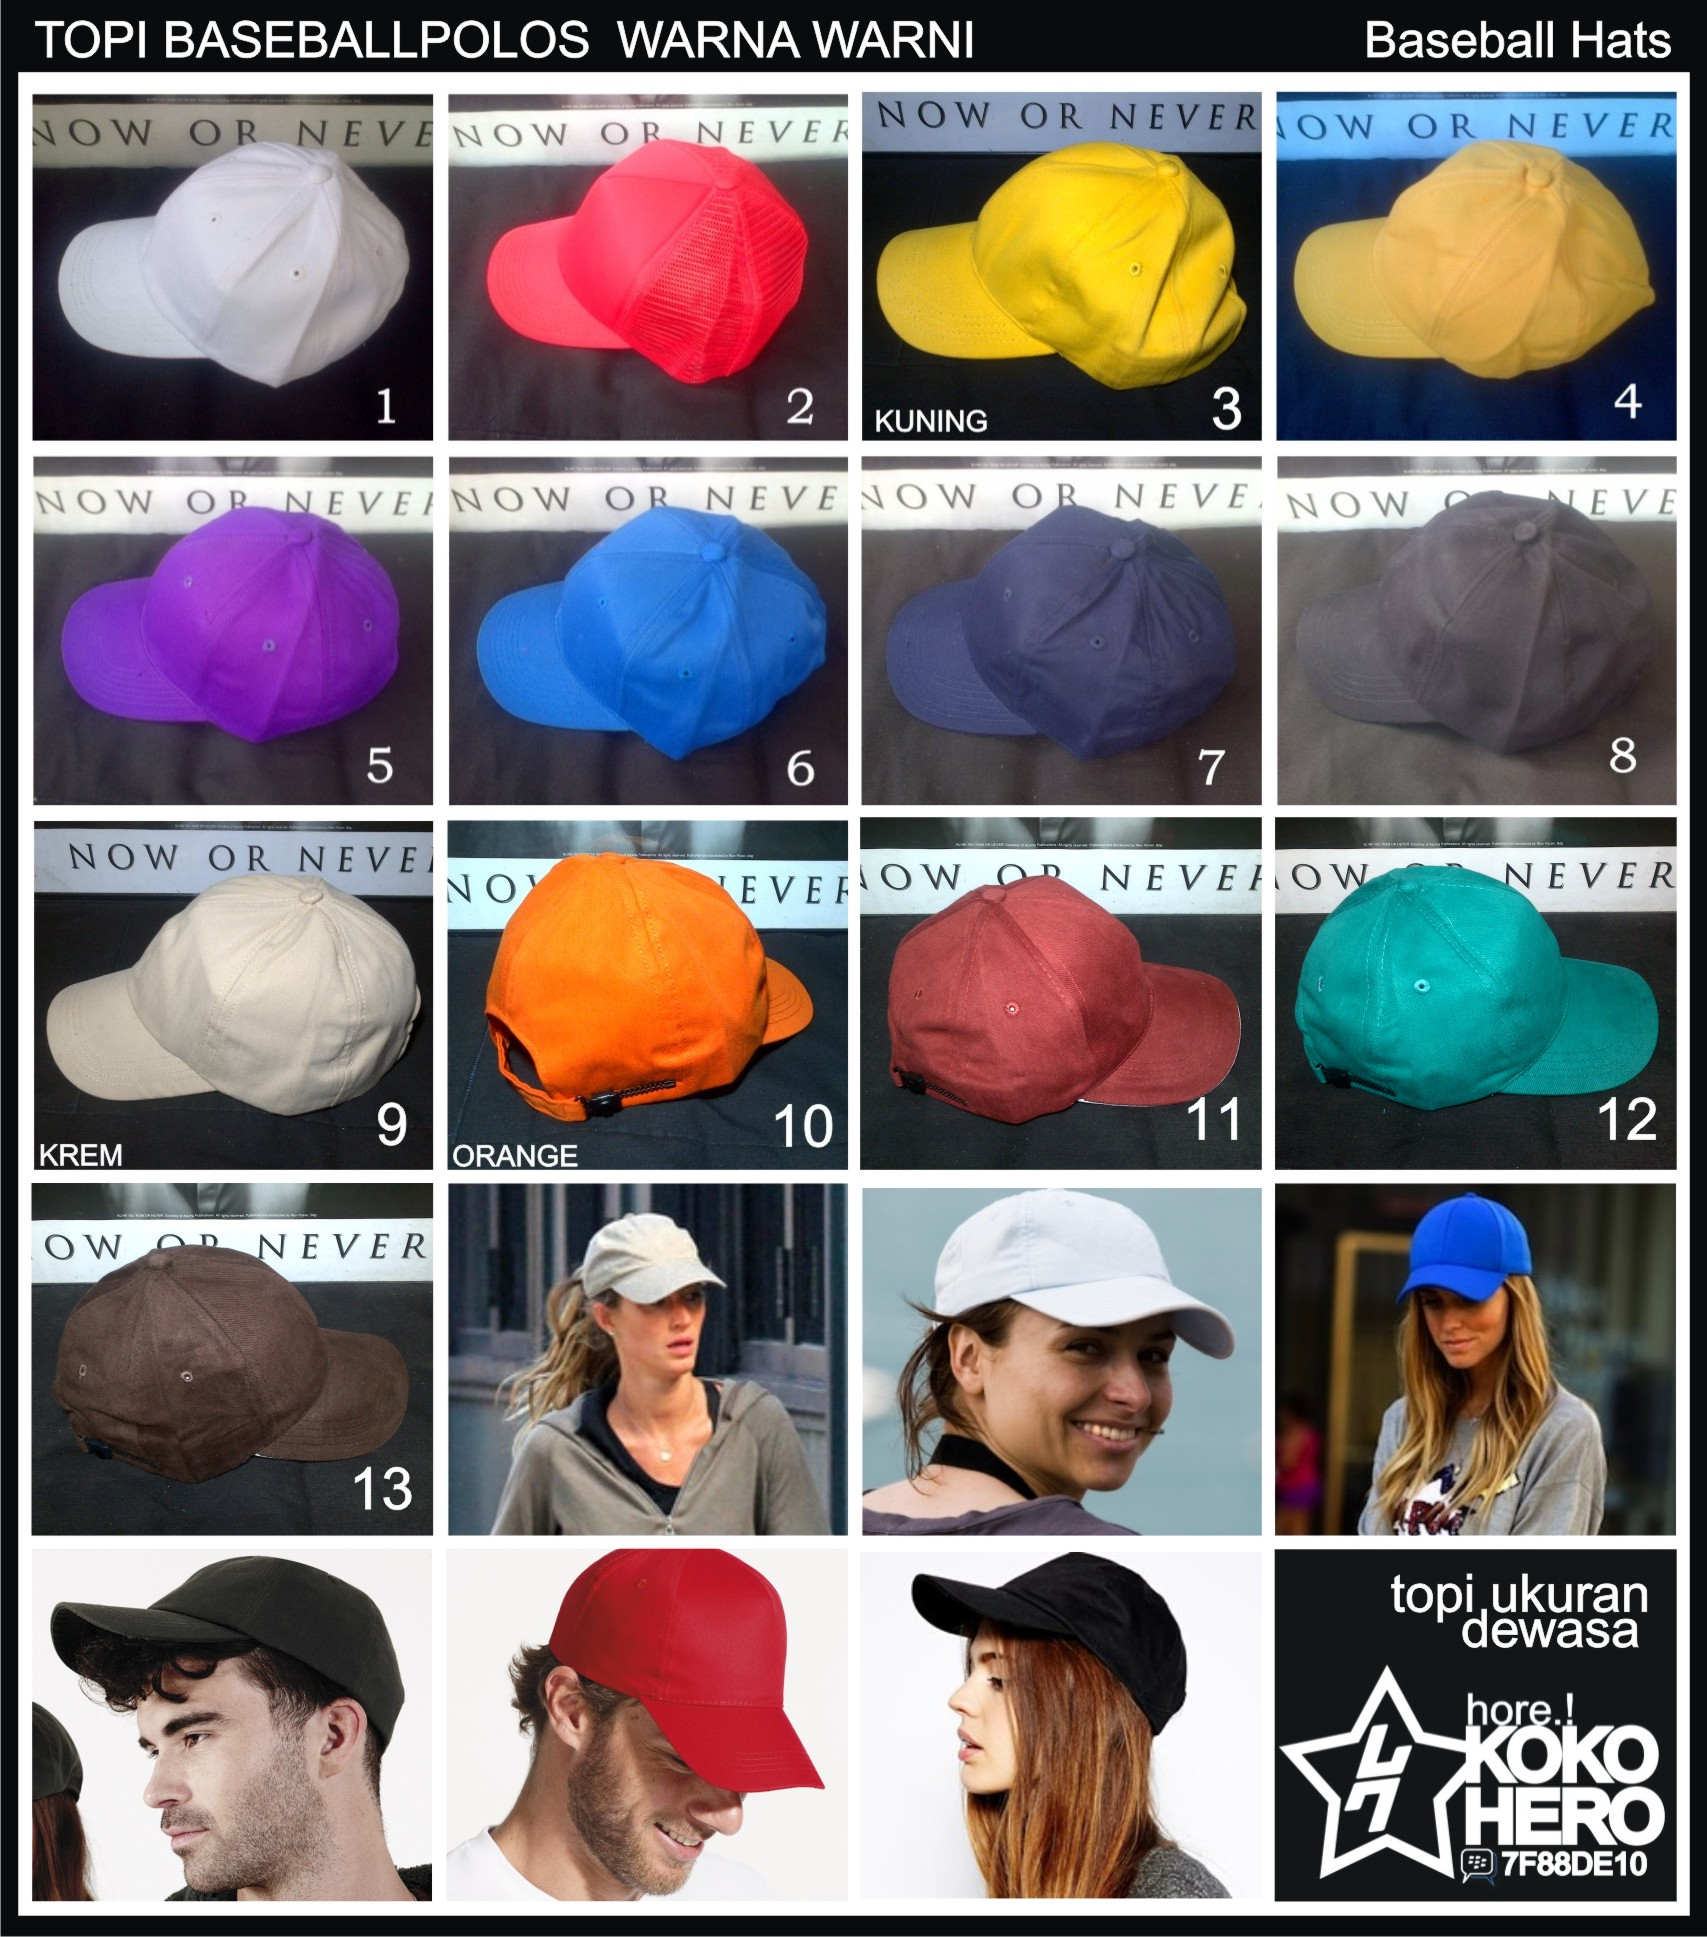 Jual Topi Baseball Polos Warna Warni Polosan bisa untuk pesanan ... 2723140e02